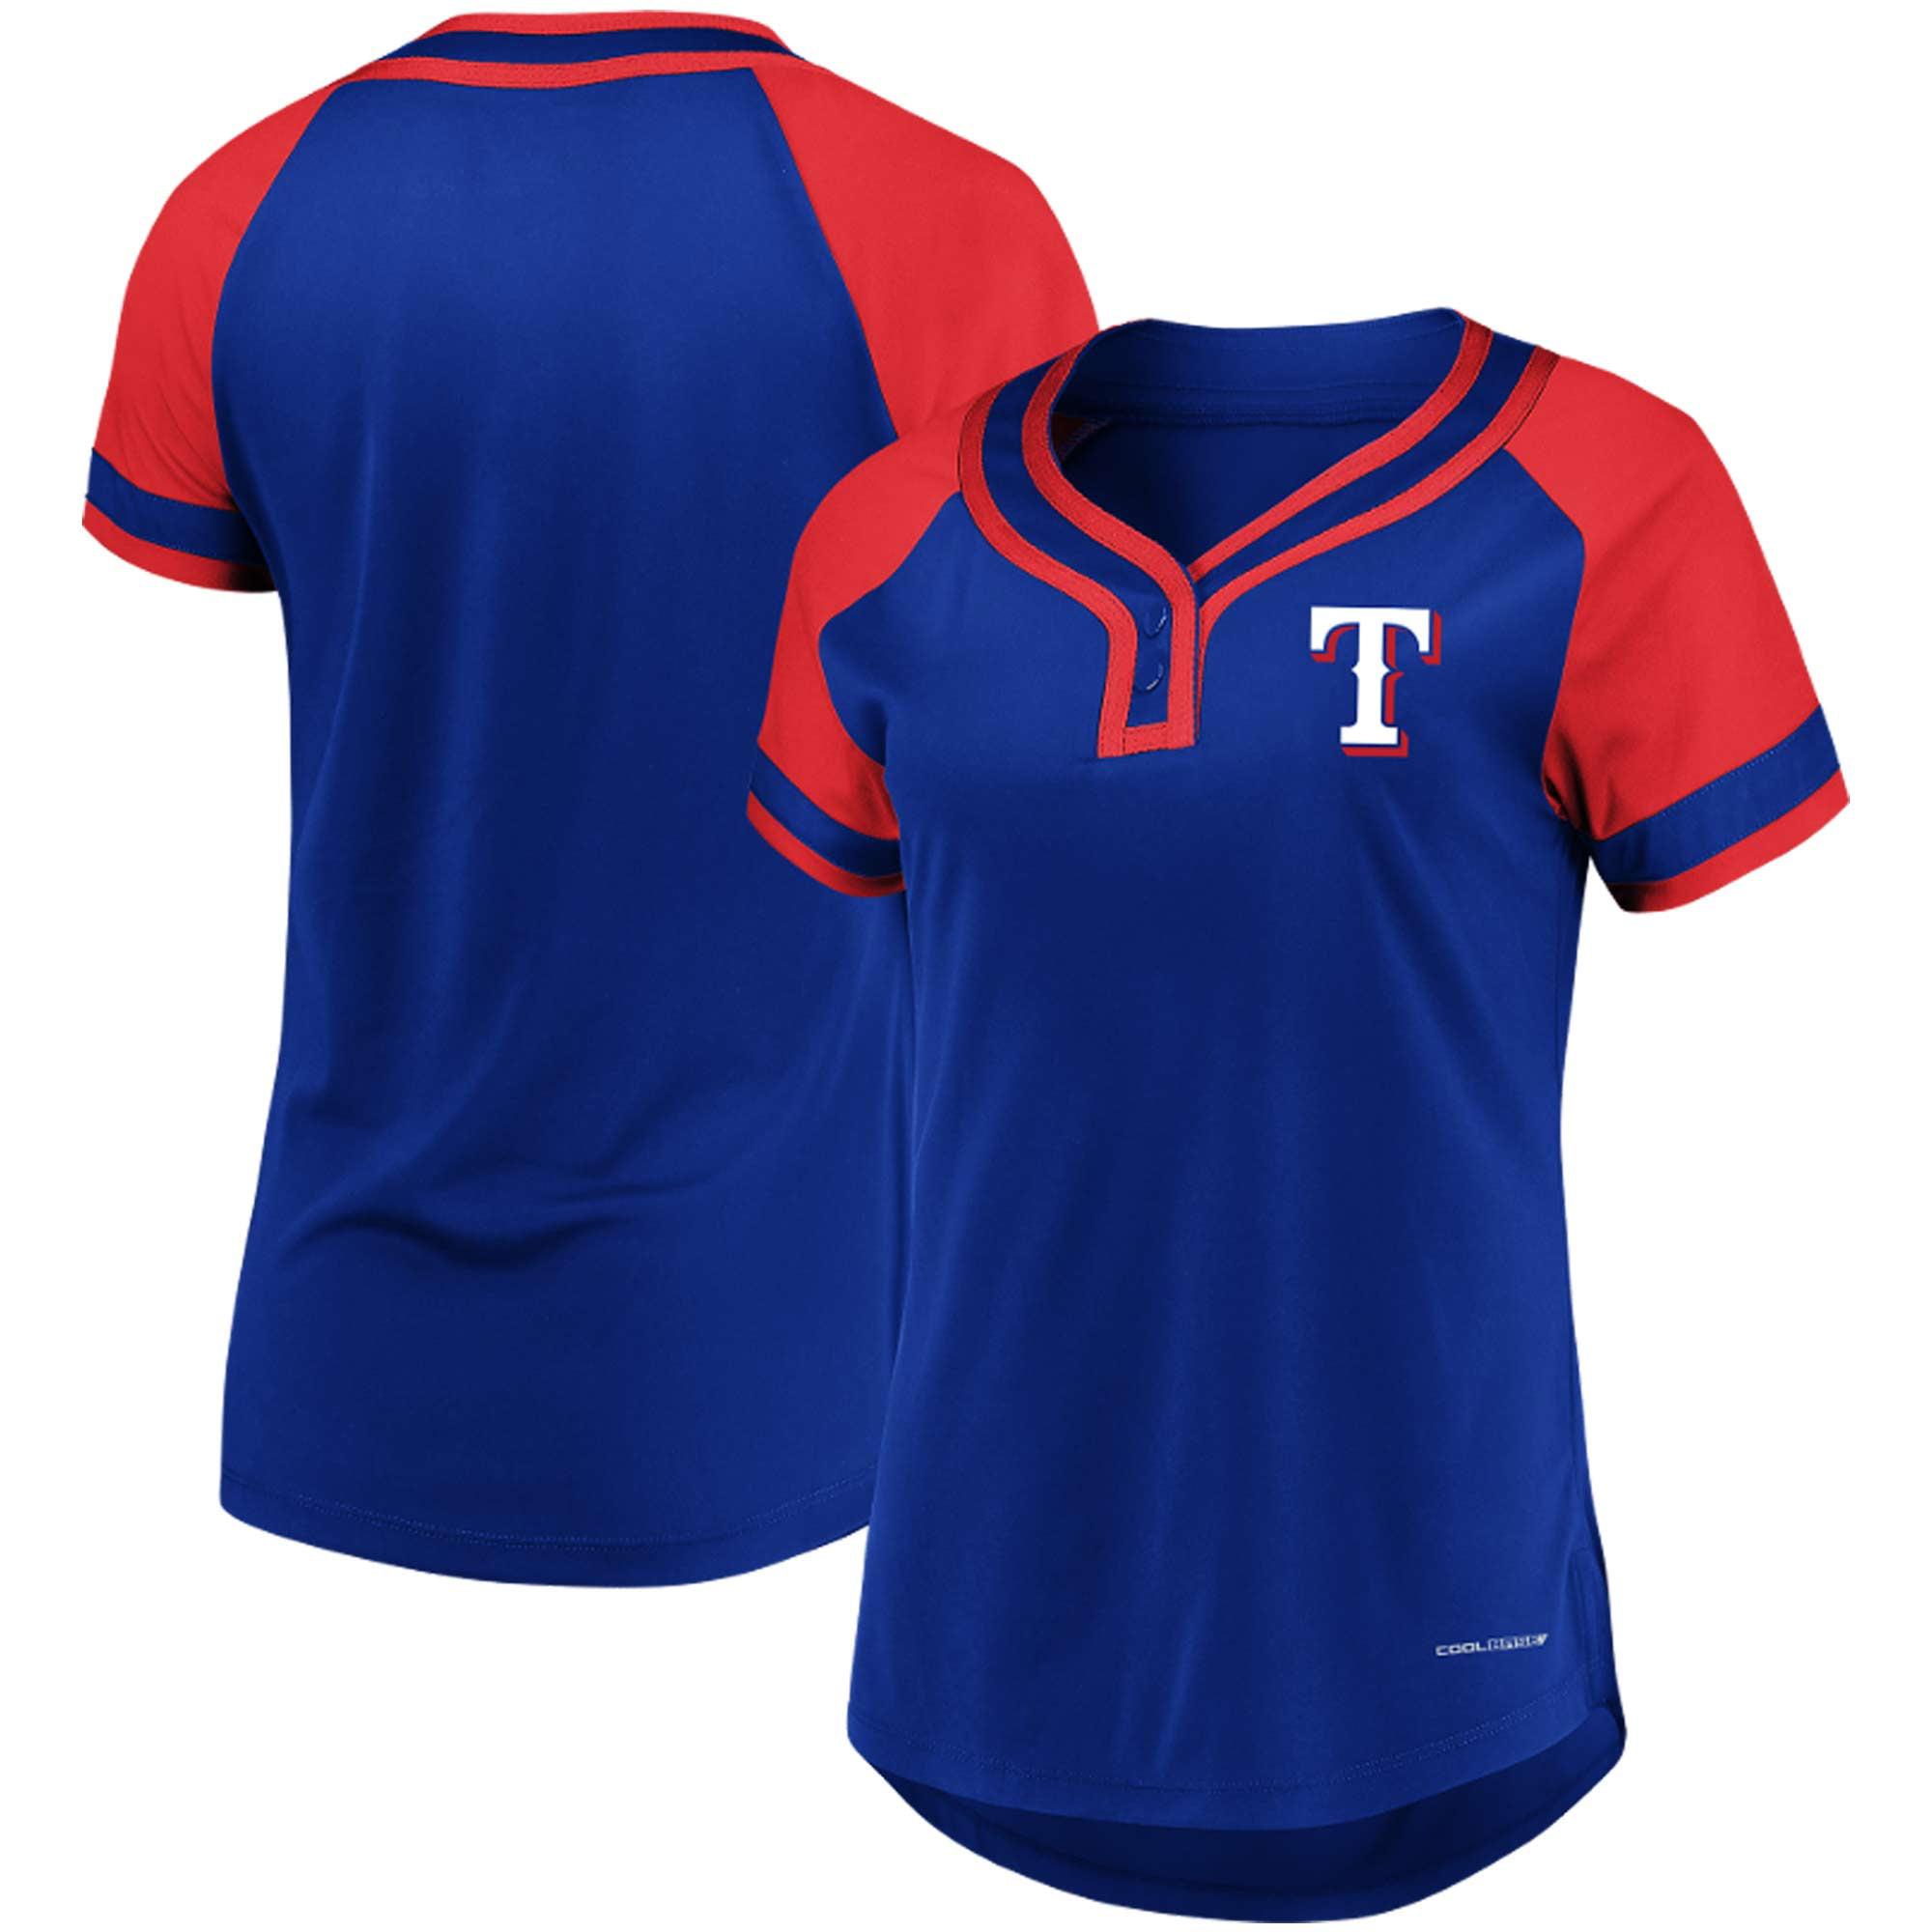 Texas Rangers Majestic Women's League Diva Raglan Placket T-Shirt - Royal